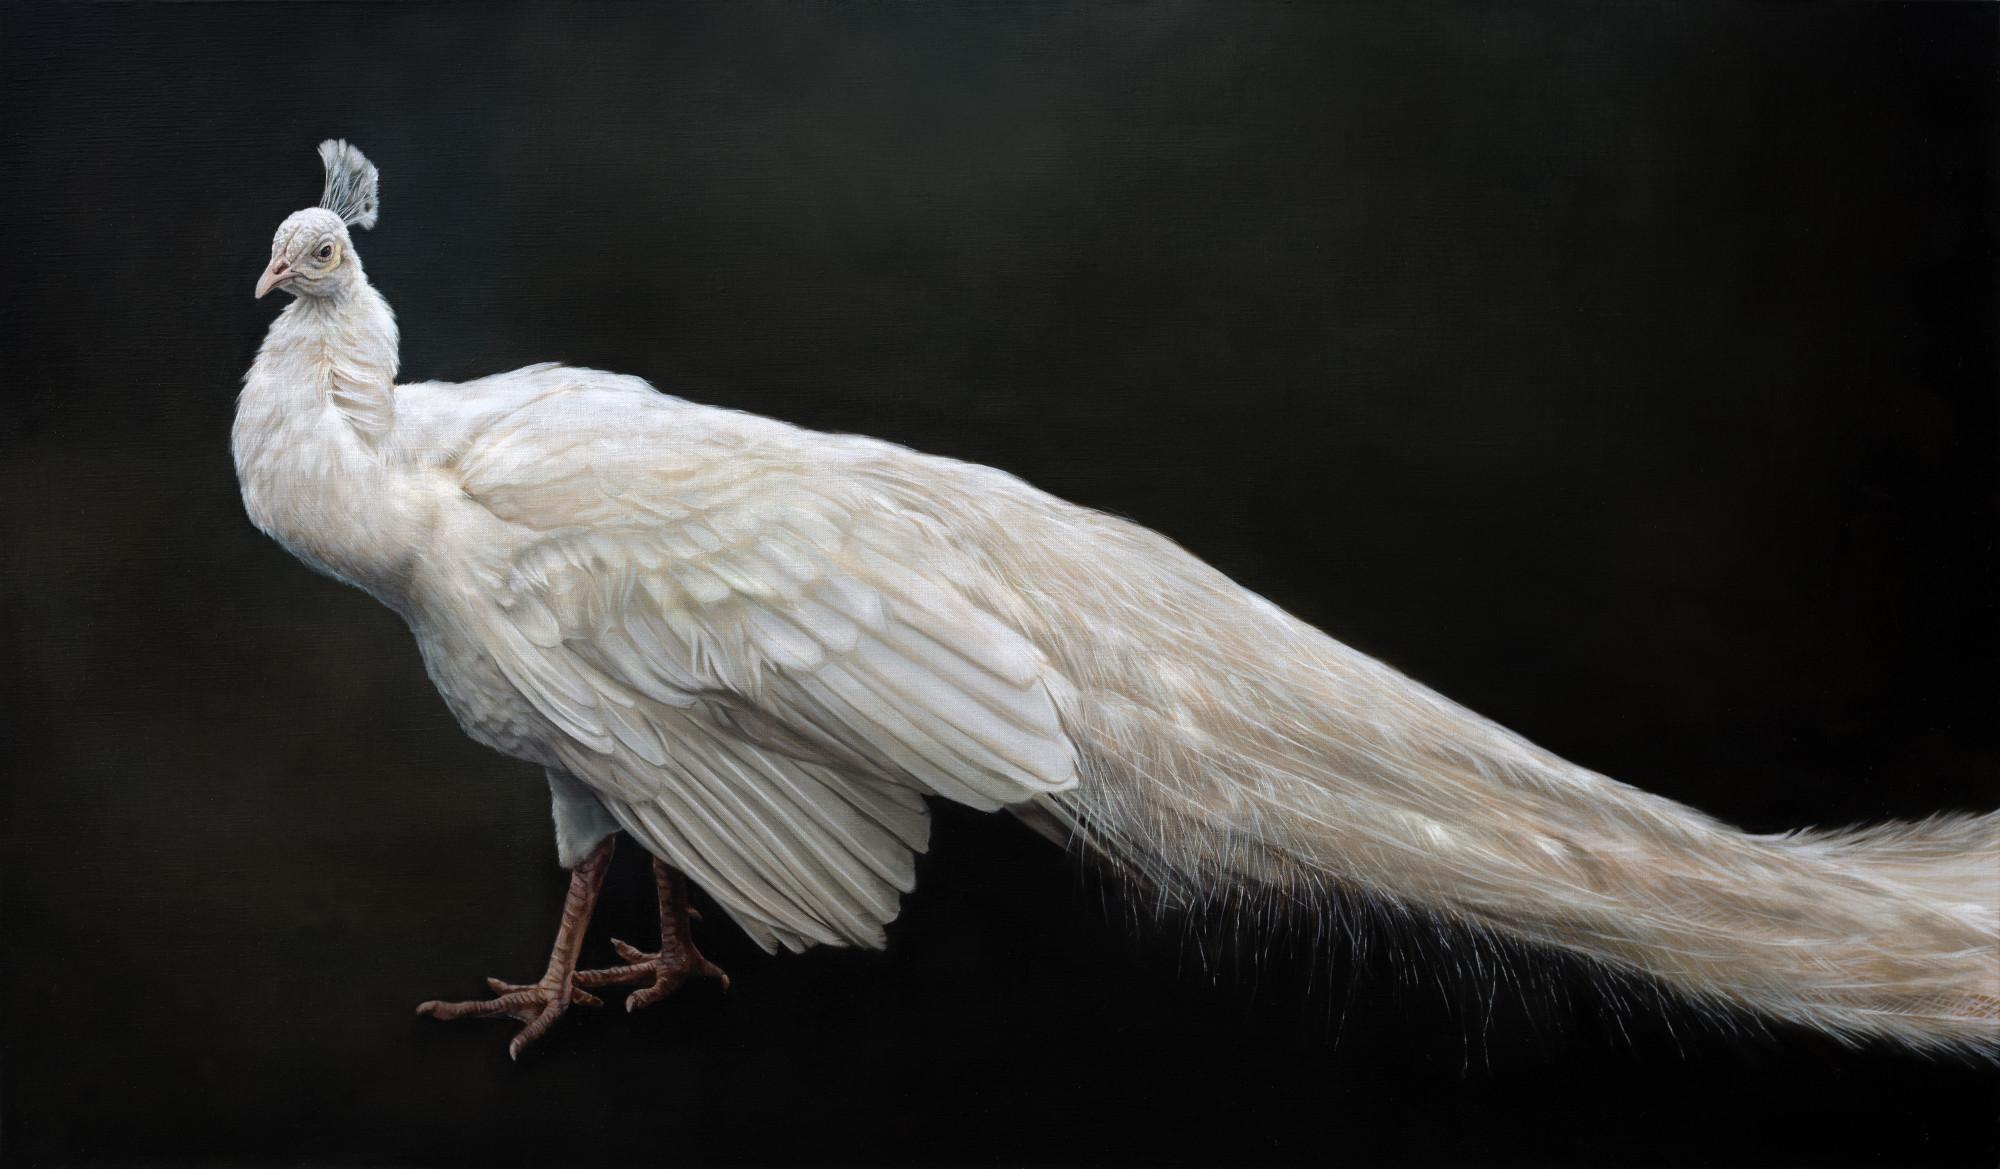 White Peacock 90 x 154 cm